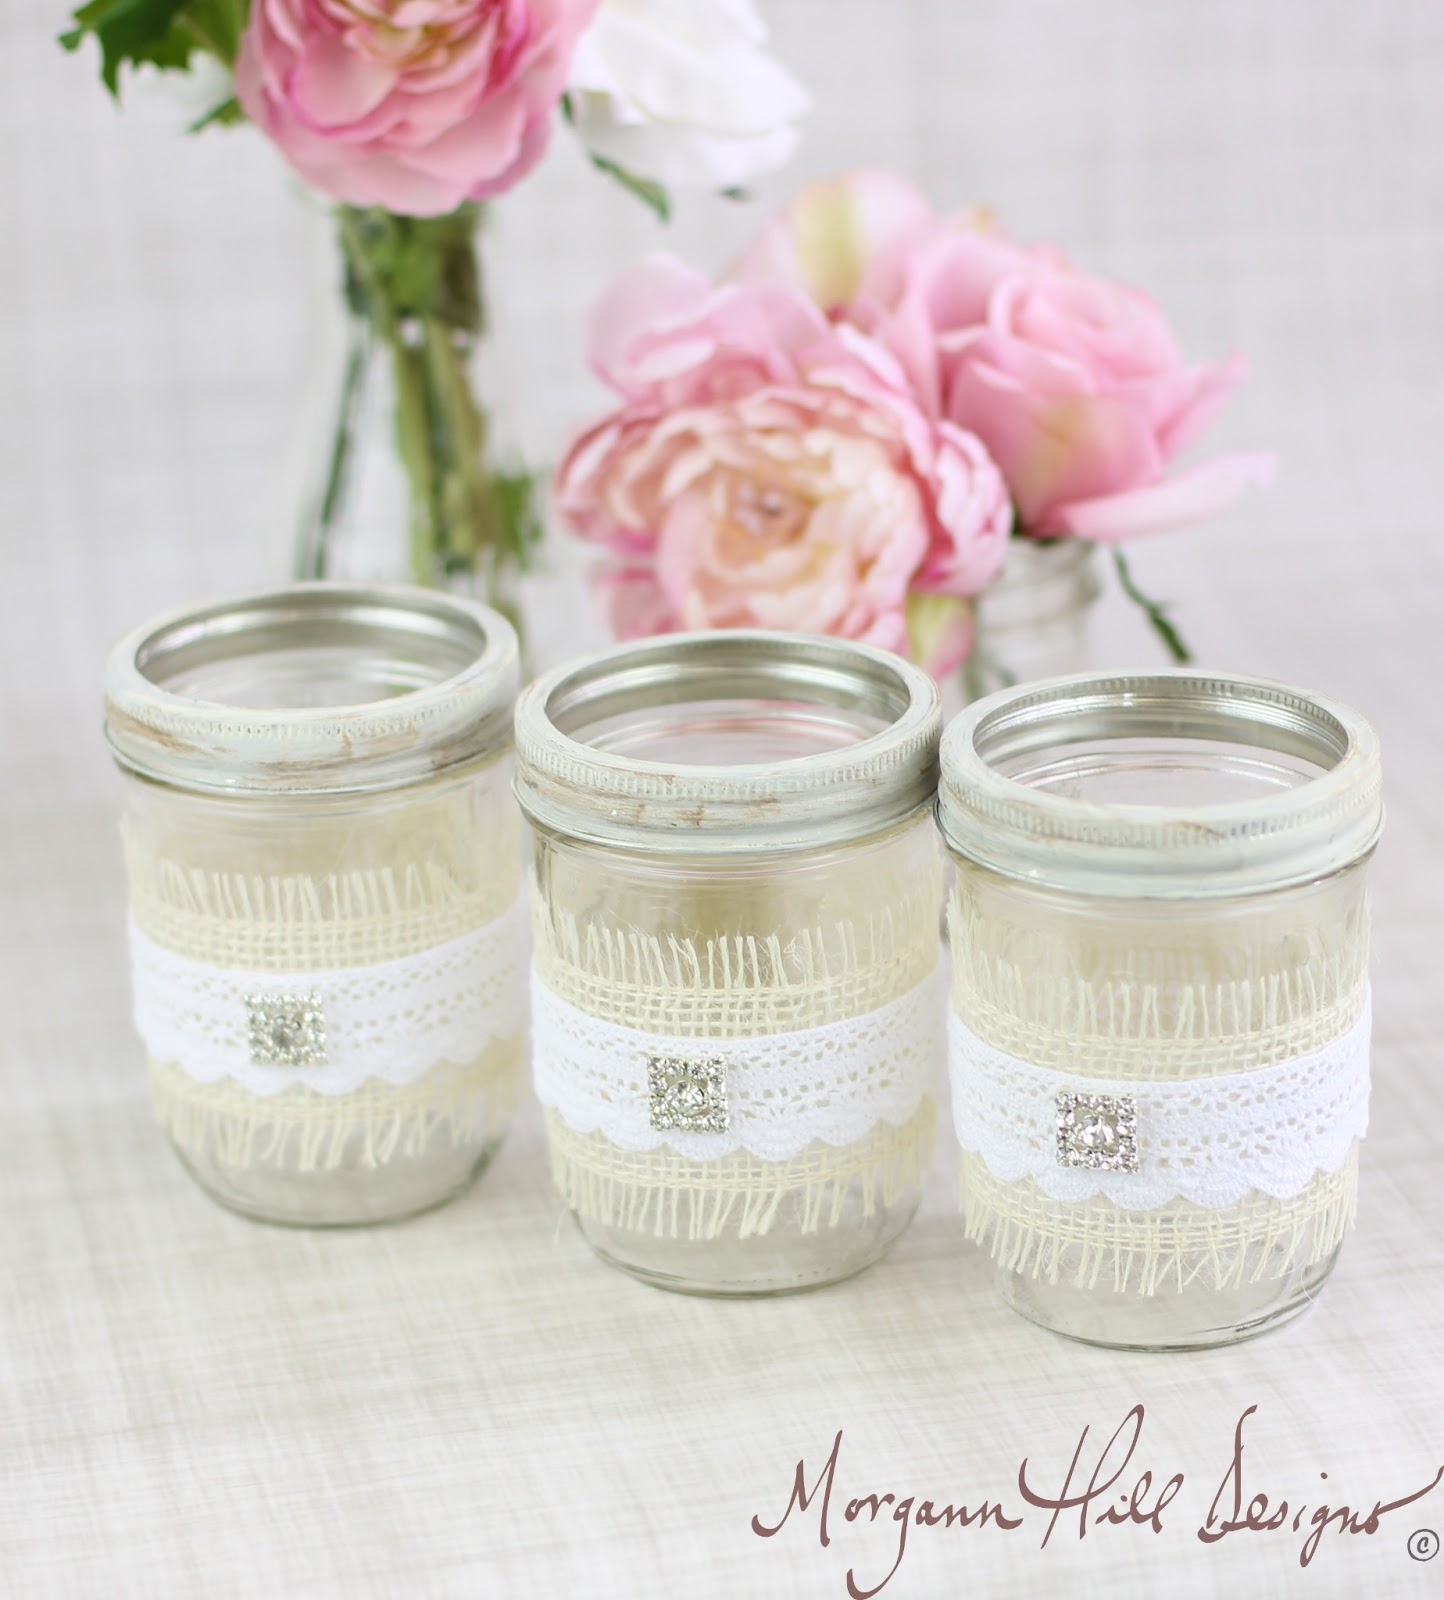 Morgann Hill Designs: Mason Jar Wedding Centerpieces Vases with ...